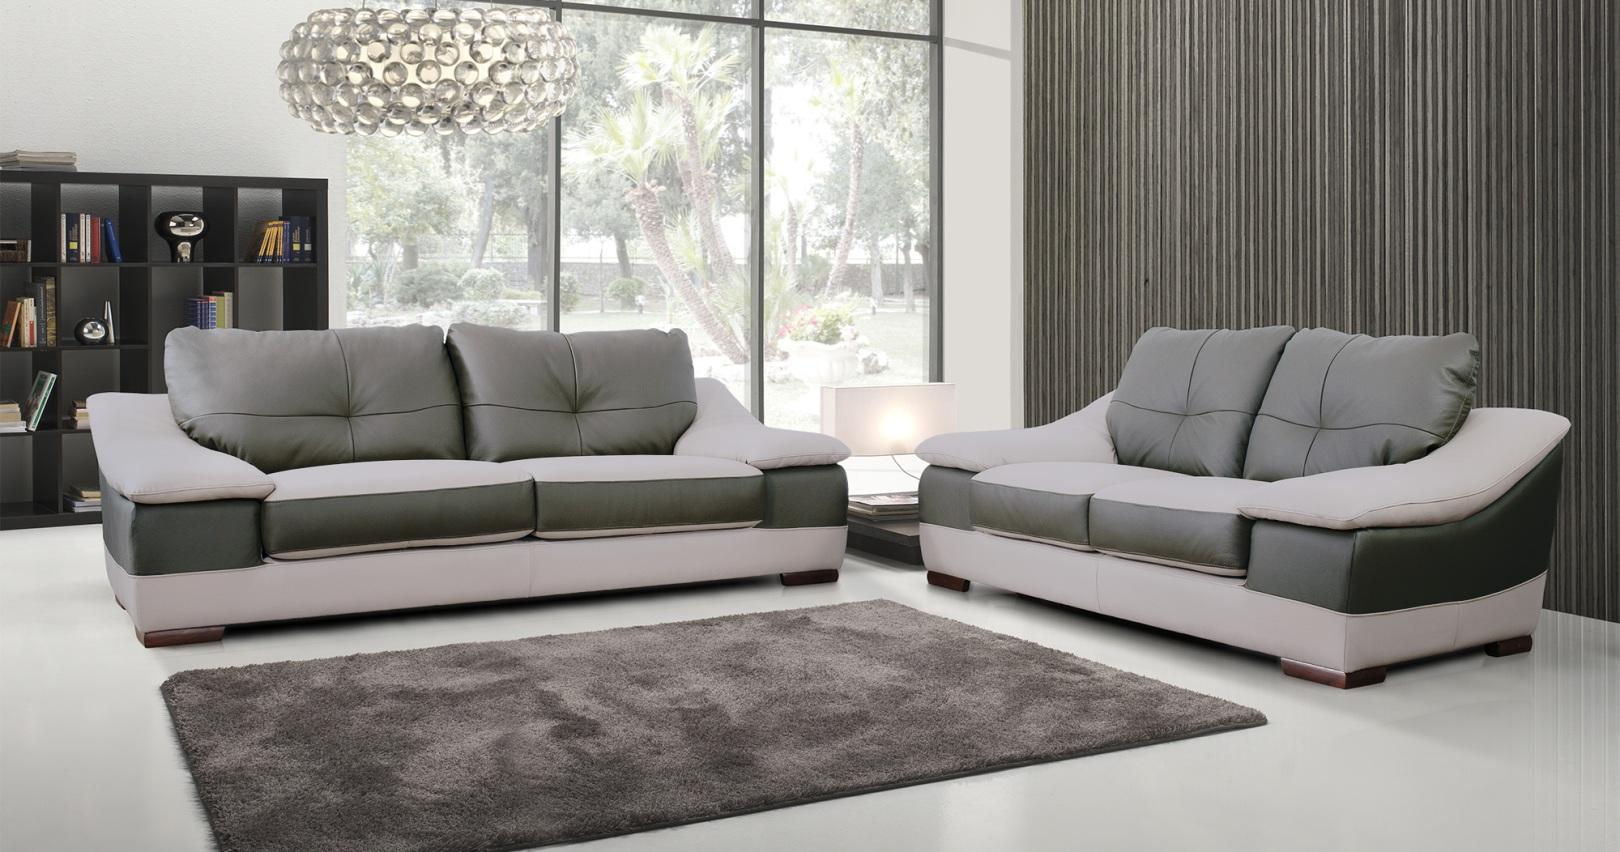 ensemble salon contemporain 3 2 prosper cuir bicolore. Black Bedroom Furniture Sets. Home Design Ideas